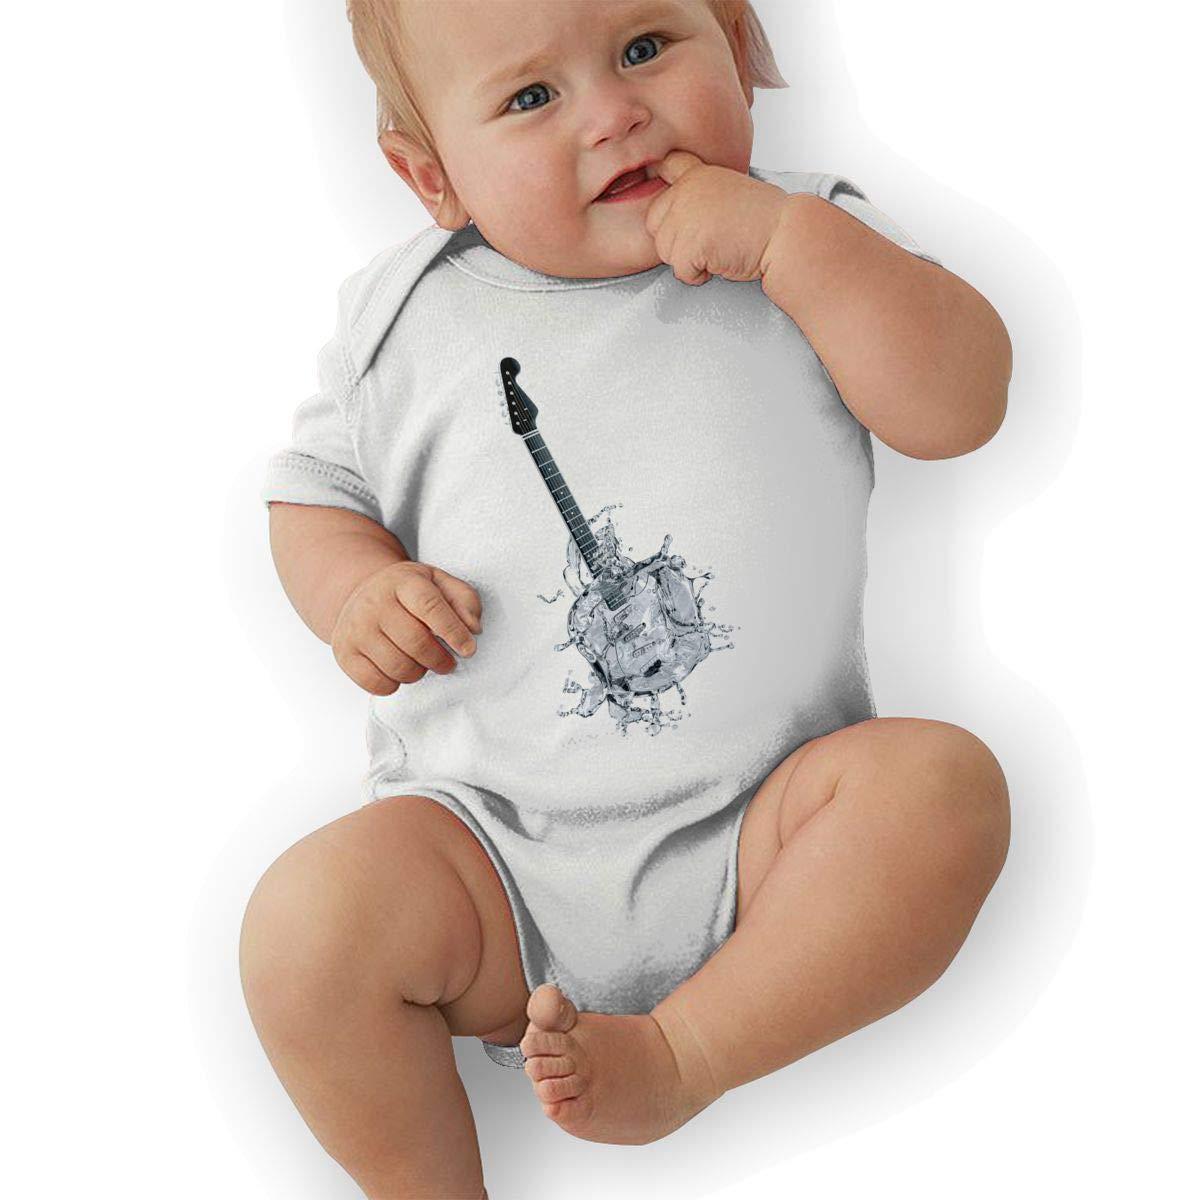 Newborn Baby Girls Bodysuit Short-Sleeve Onesie Creative Guitar Water Print Outfit Summer Pajamas